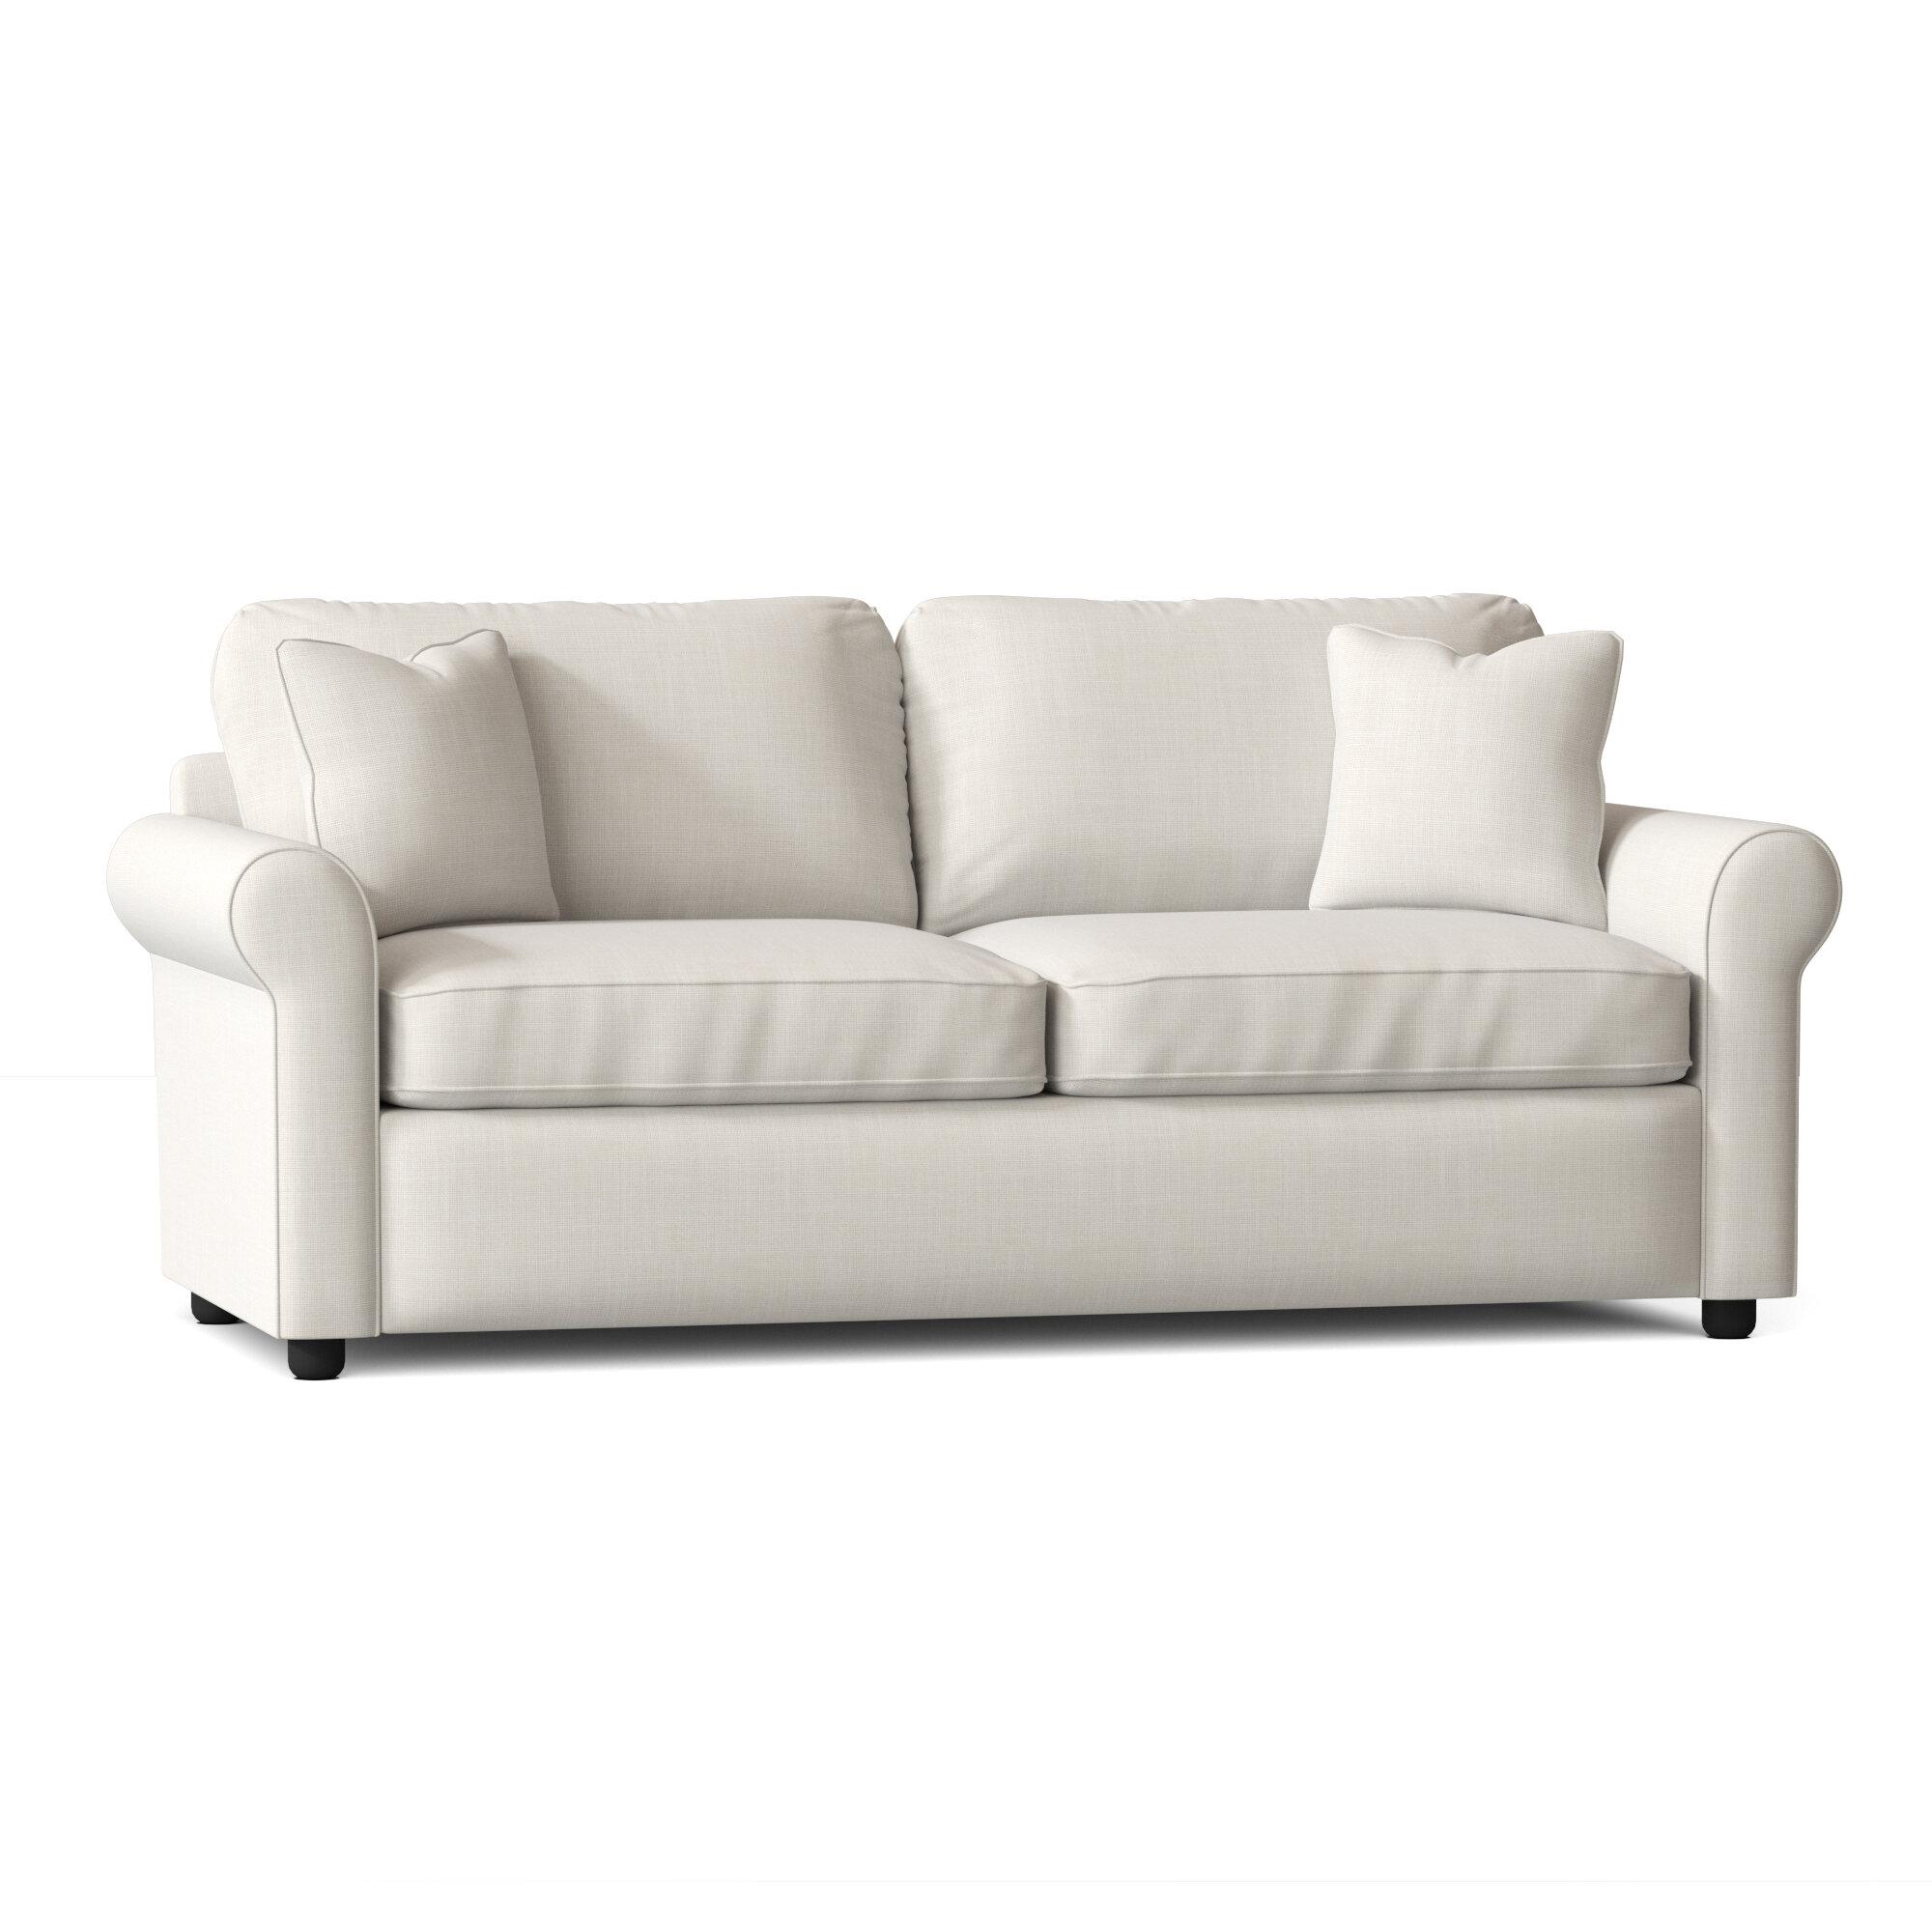 Wayfair Custom Upholstery 82 Rolled Arm Sofa Reviews Wayfair